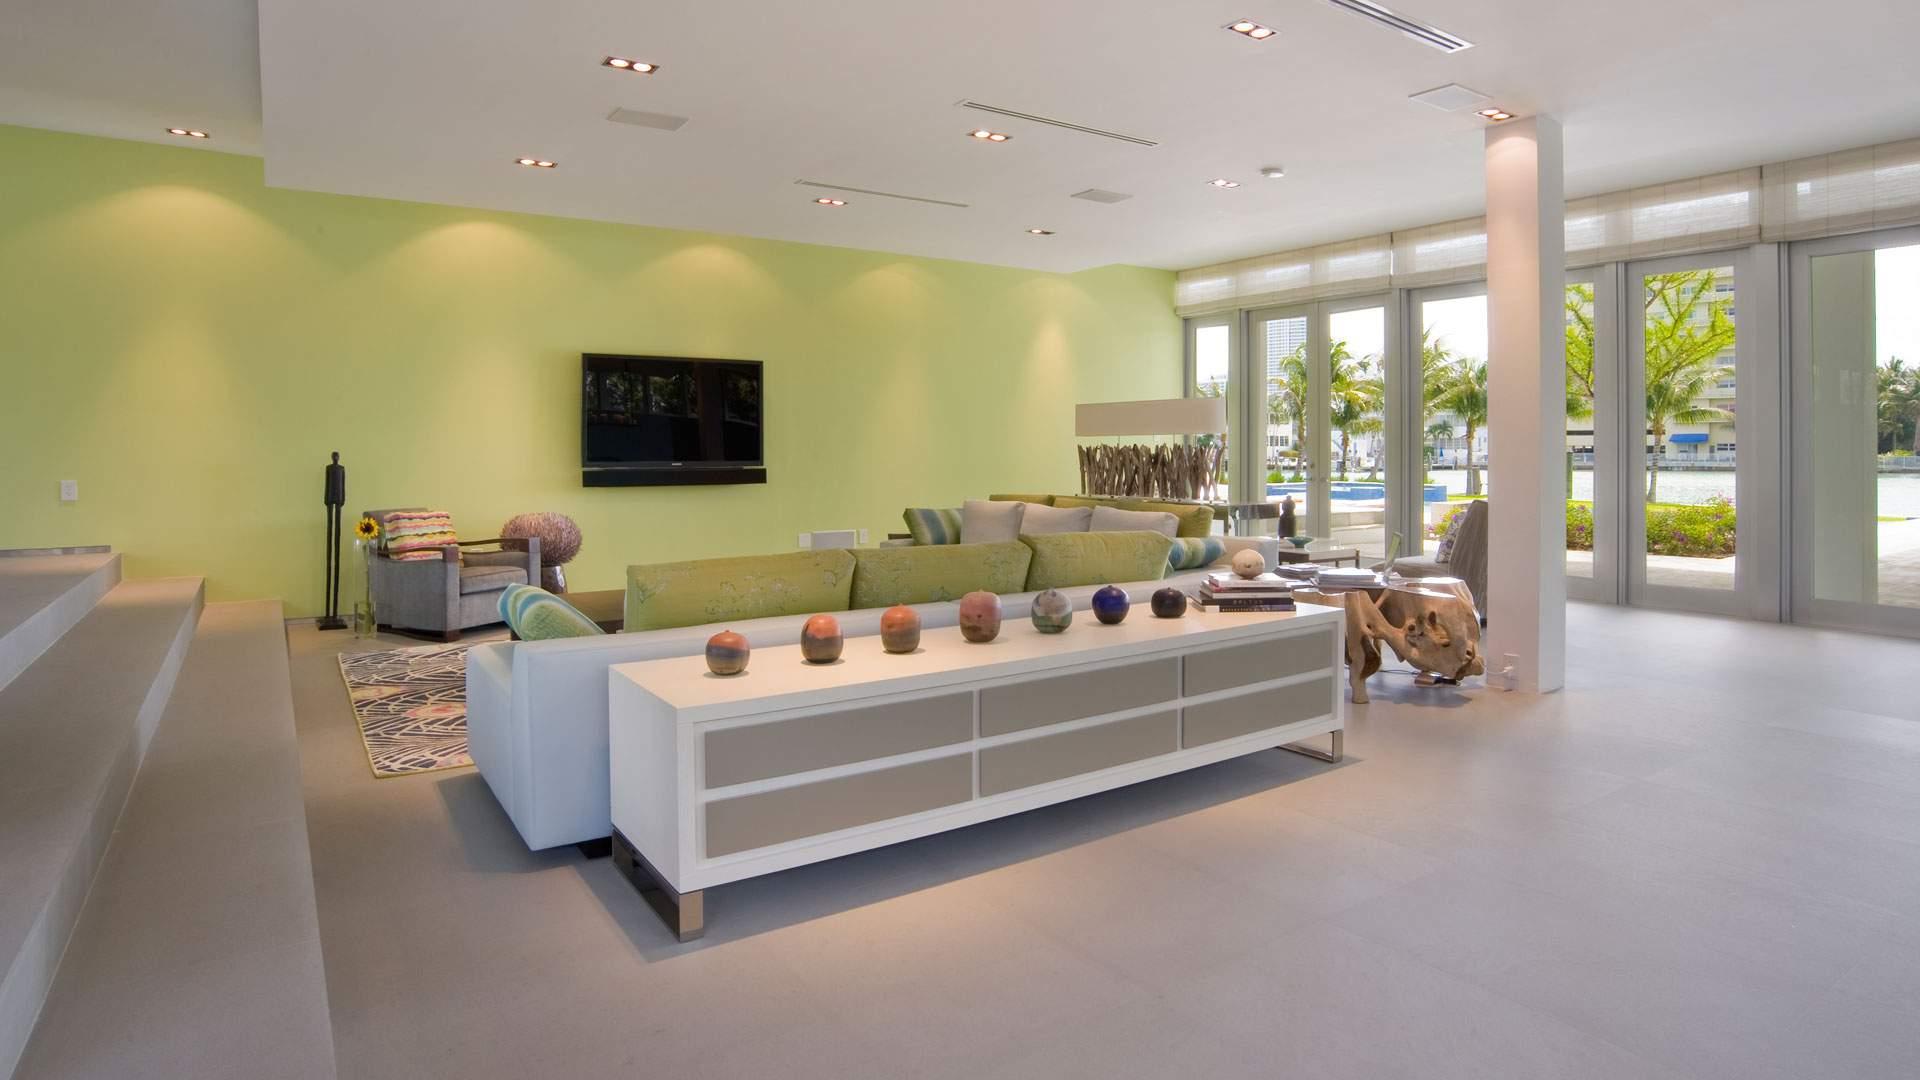 Miami Beach Glass House   Personalized Interior Design For Discerning  Clientele